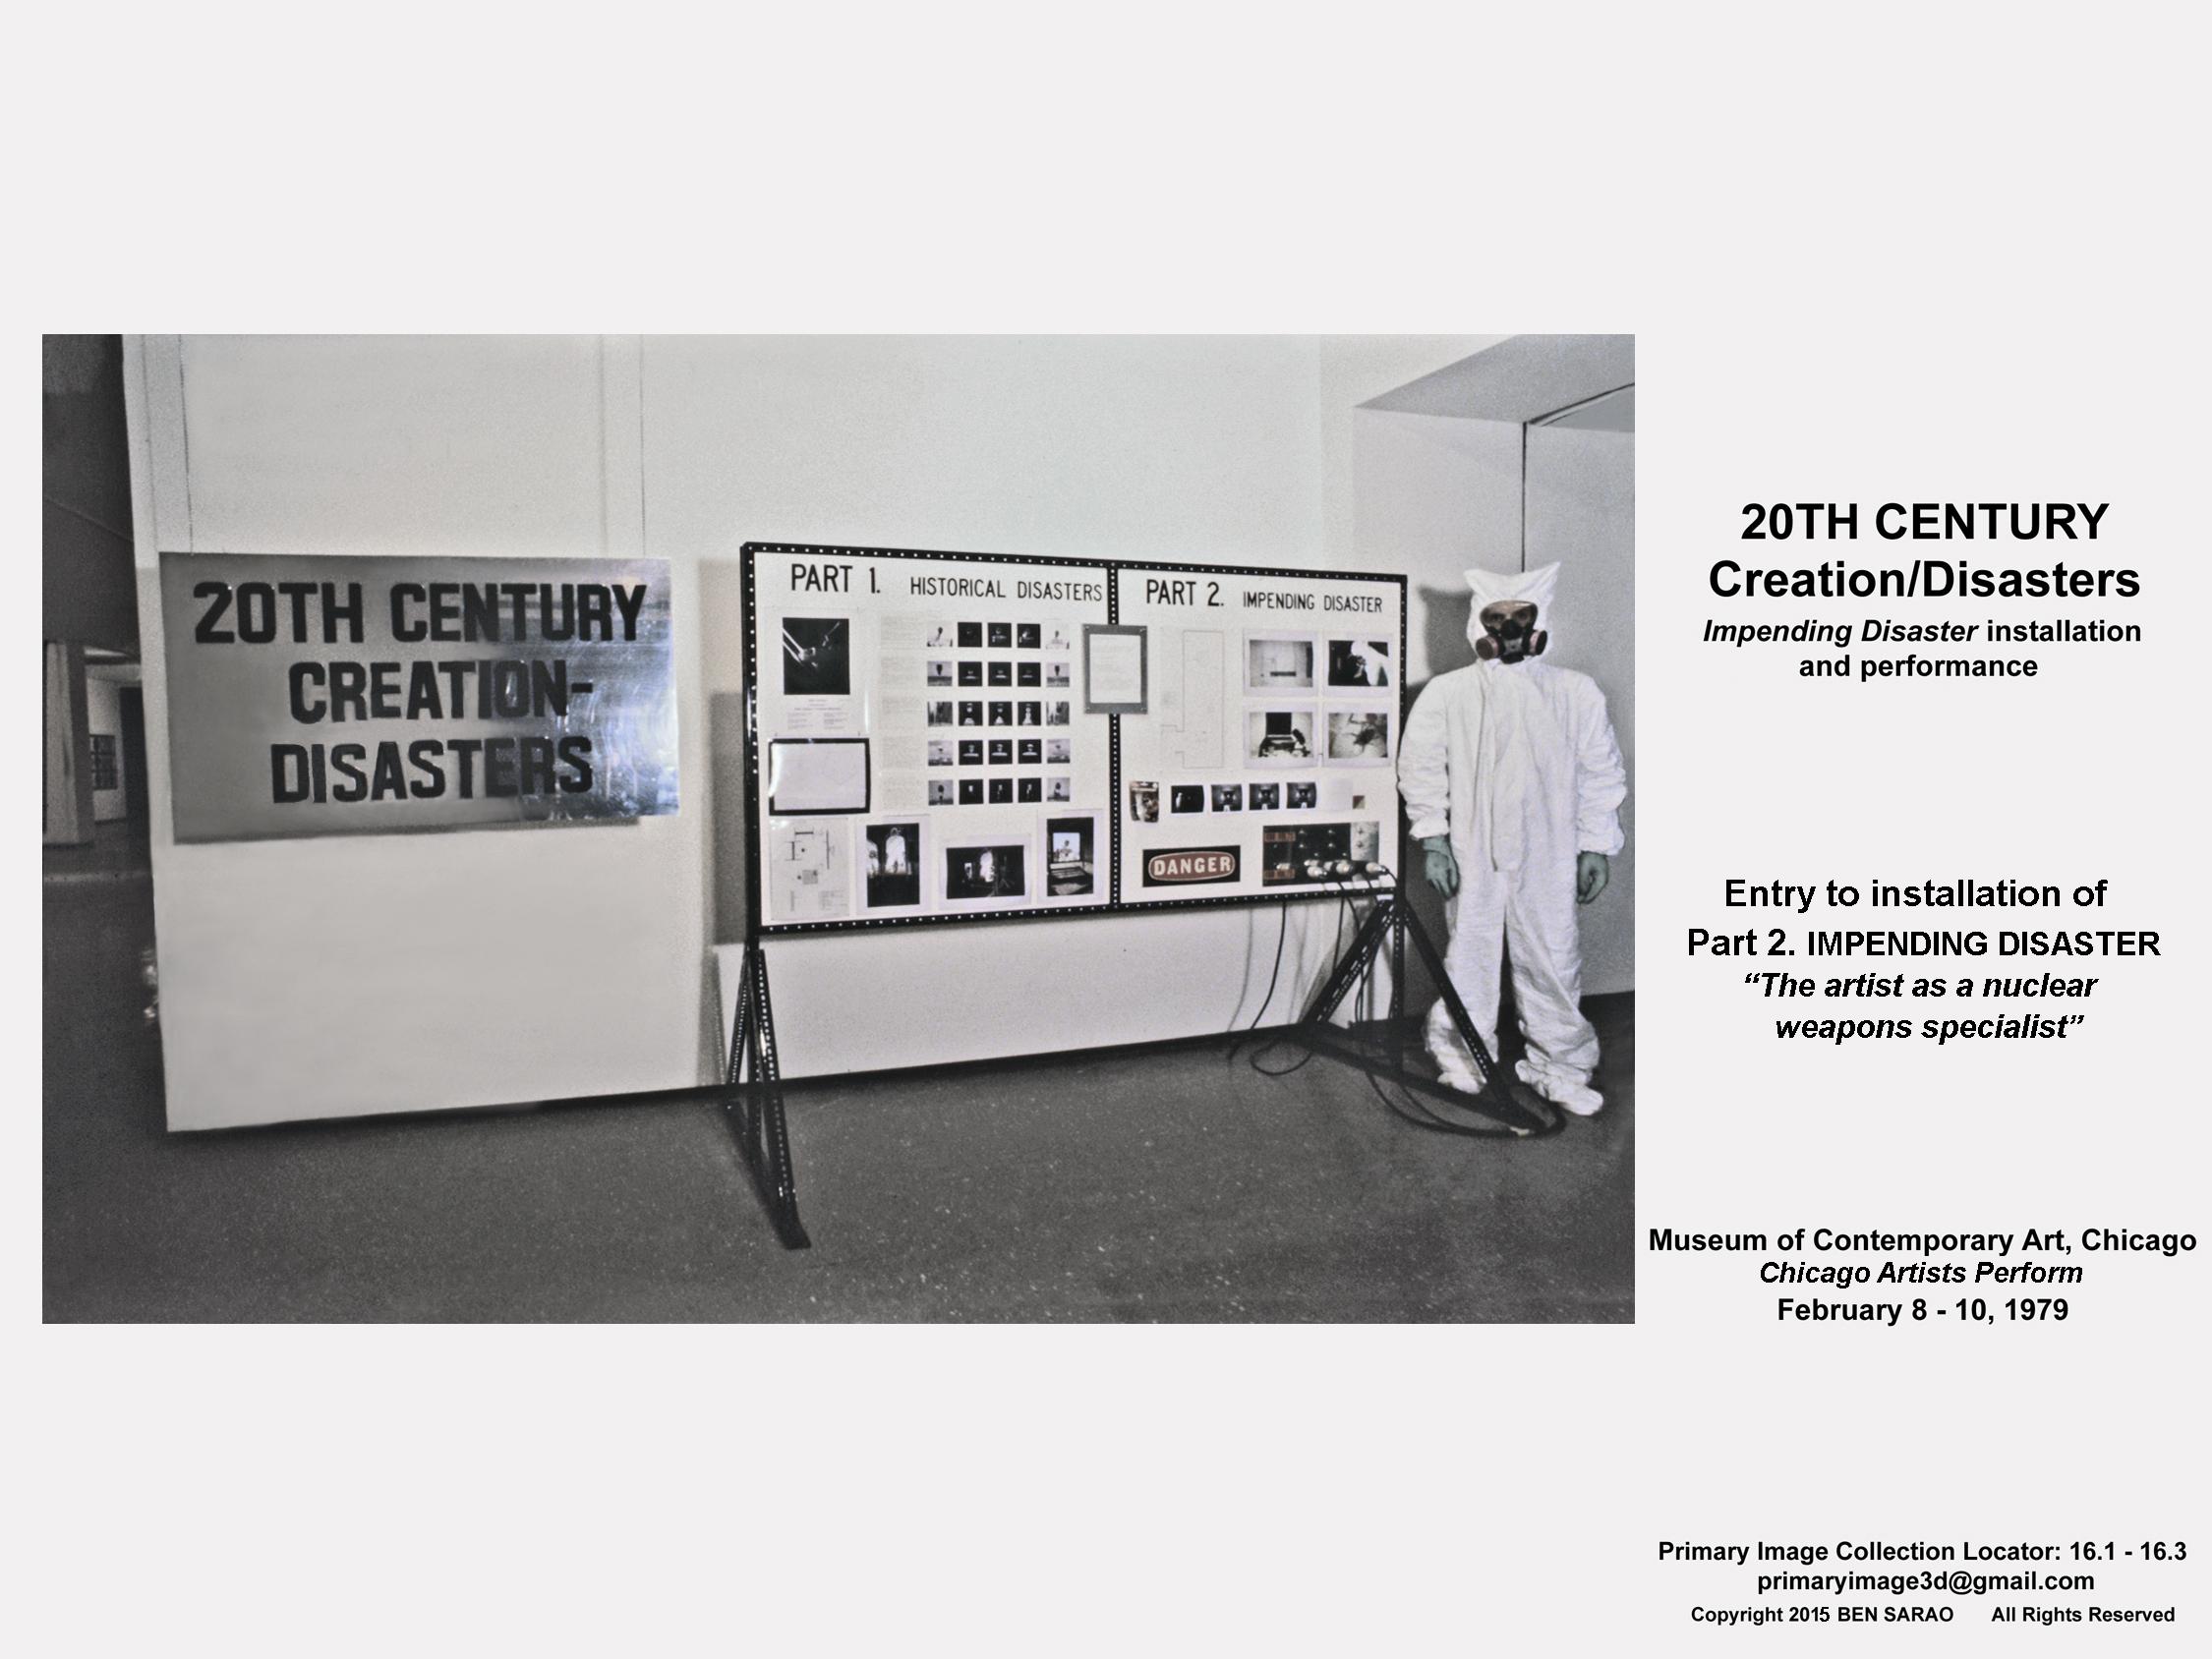 28.III. 2)th Century MOCA Chicago 1979.jpg